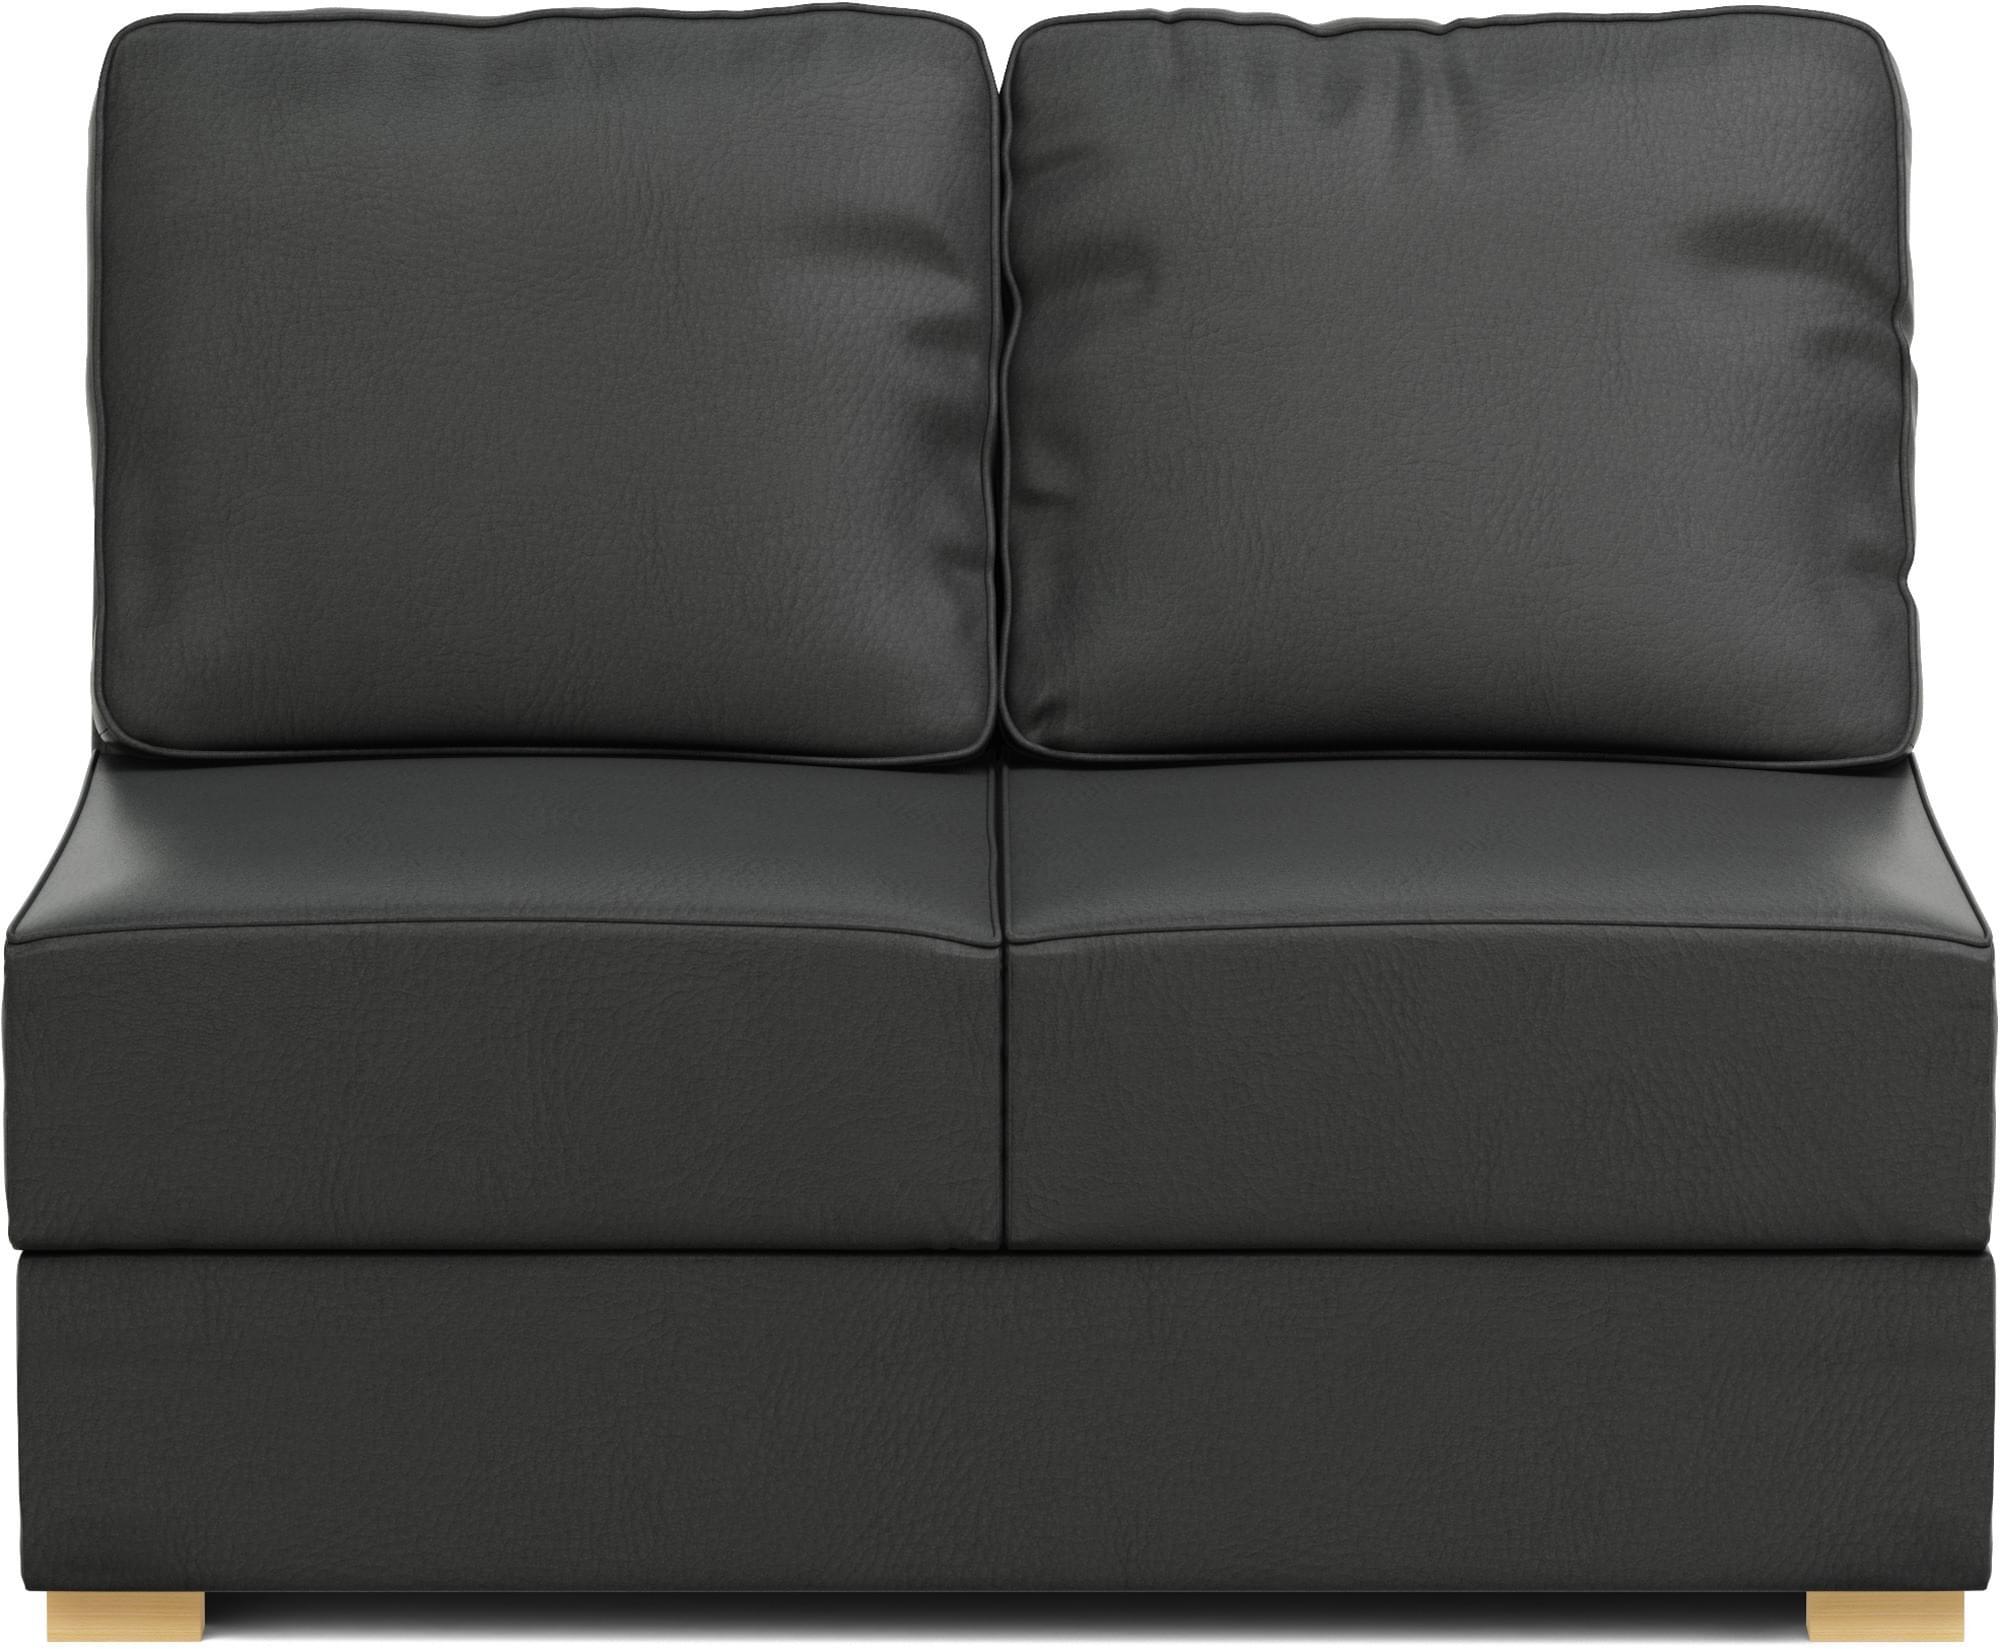 Lear small 2 seat armless space saving sofa nabru for Sofa 120 cm lang